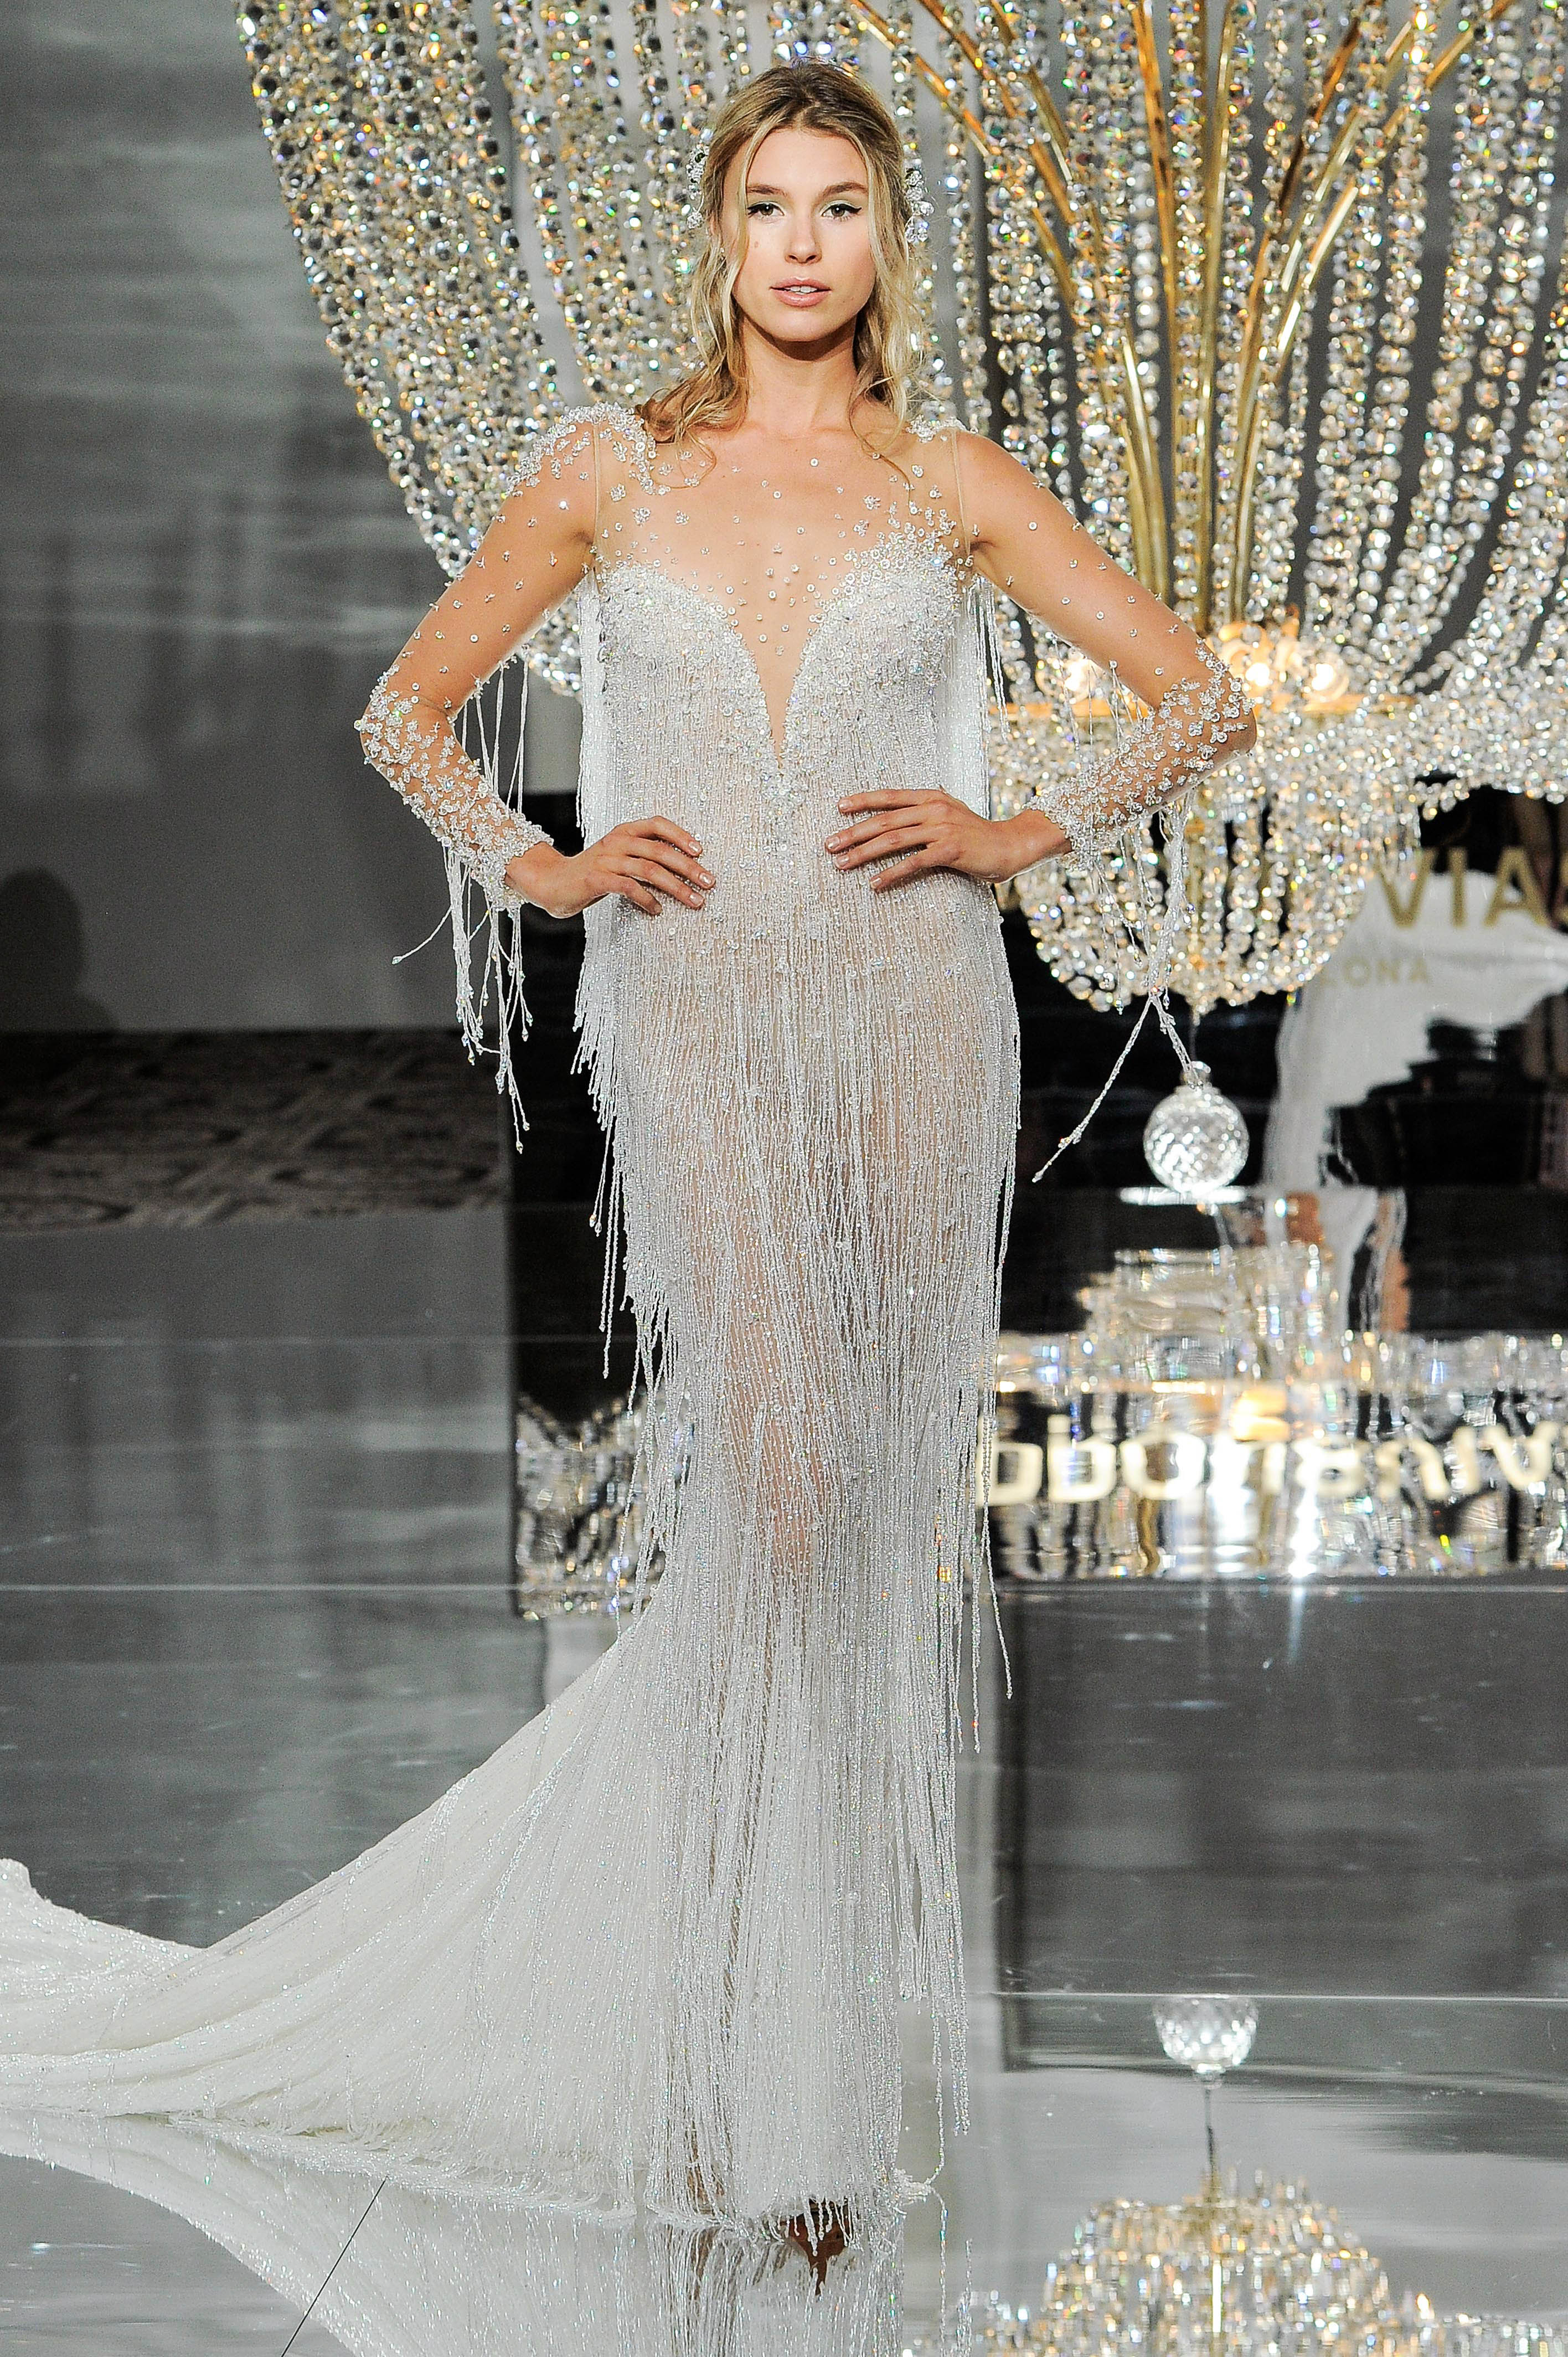 pronovias wedding dress fall 2018 illusion long sleeves fringe trumpet